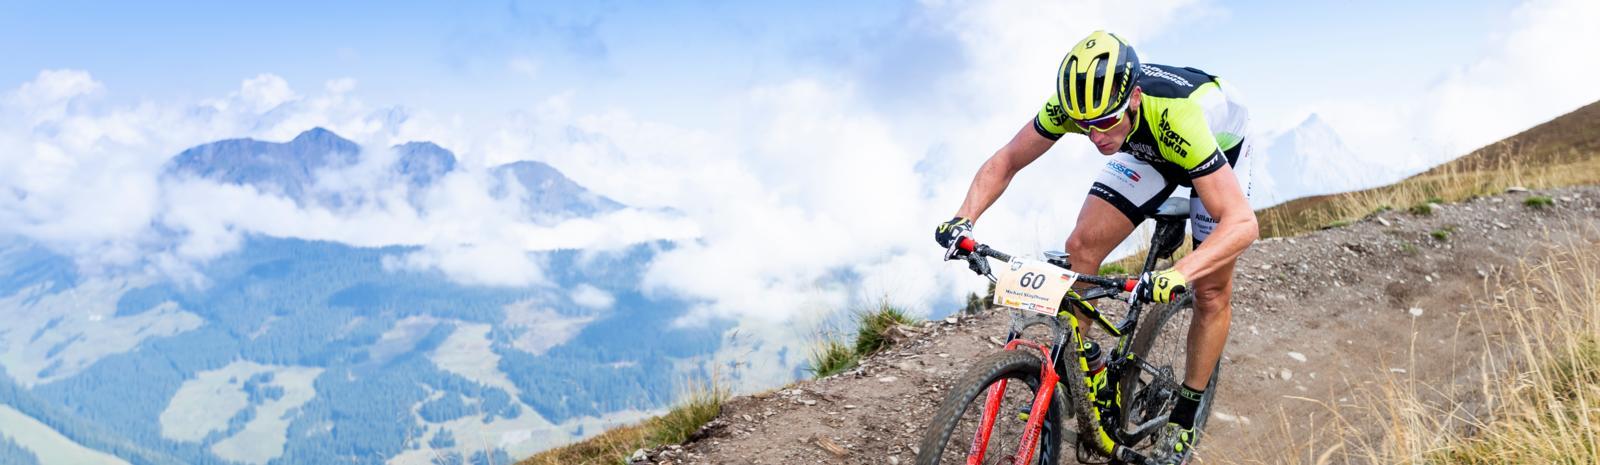 21e world games of mountainbiking